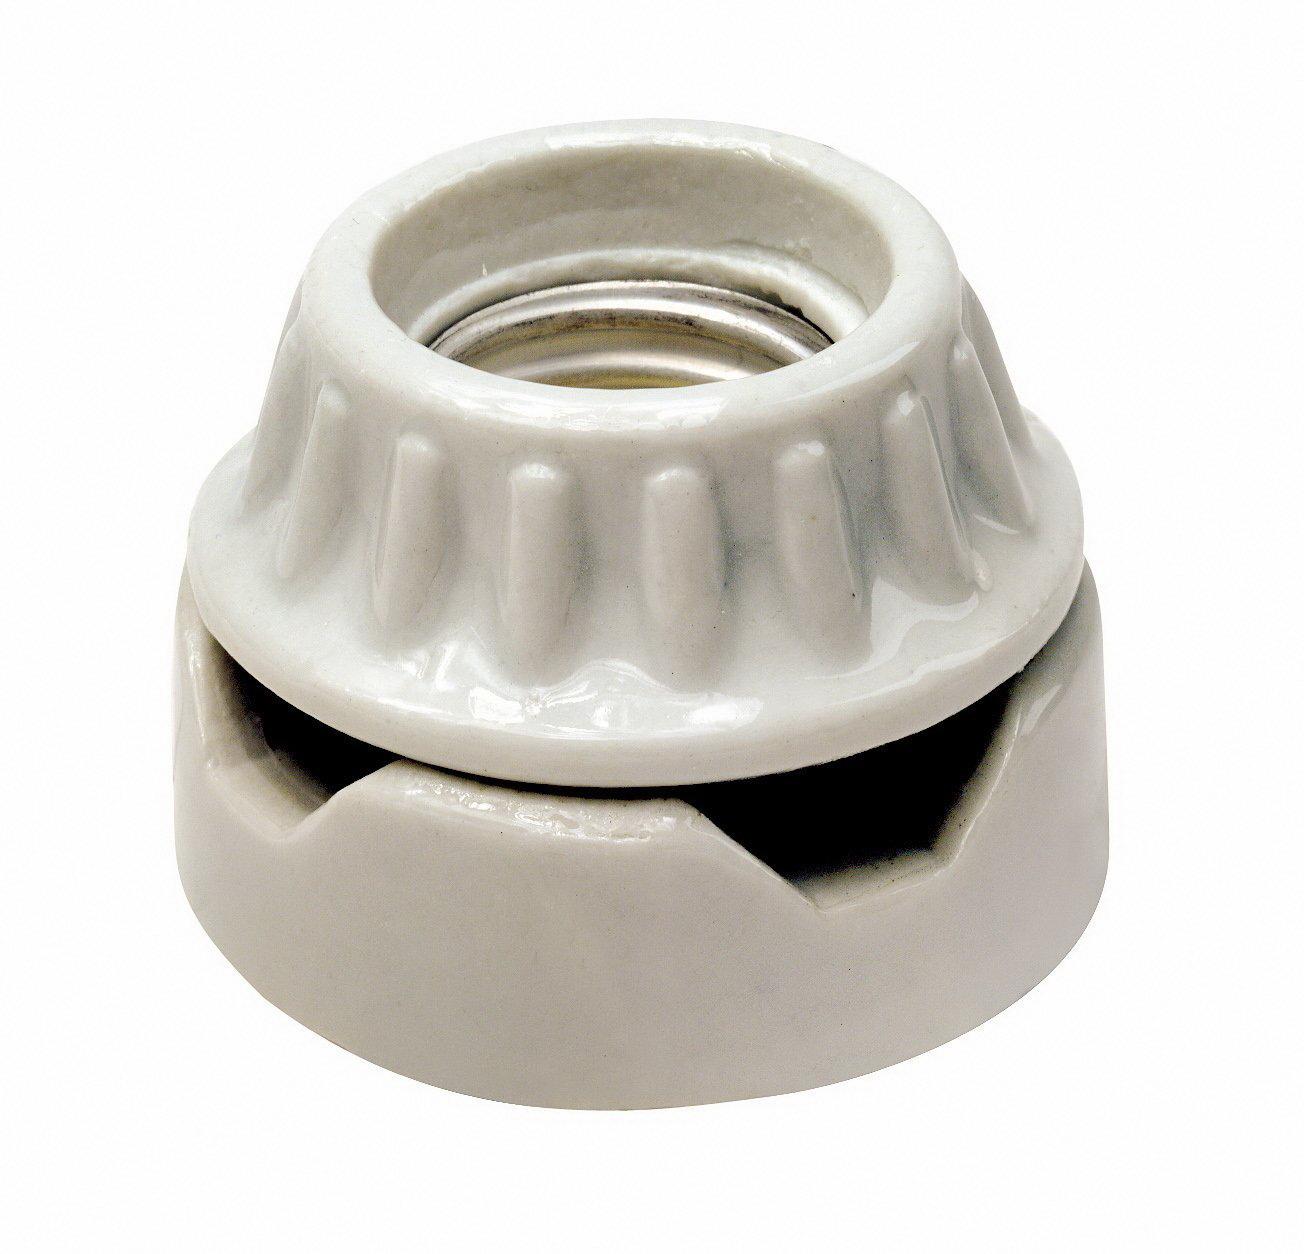 Leviton 001-09880-000 1-Circuit 2-Piece Keyless Lamp Holder, 660 W, Incandescent, Medium, White